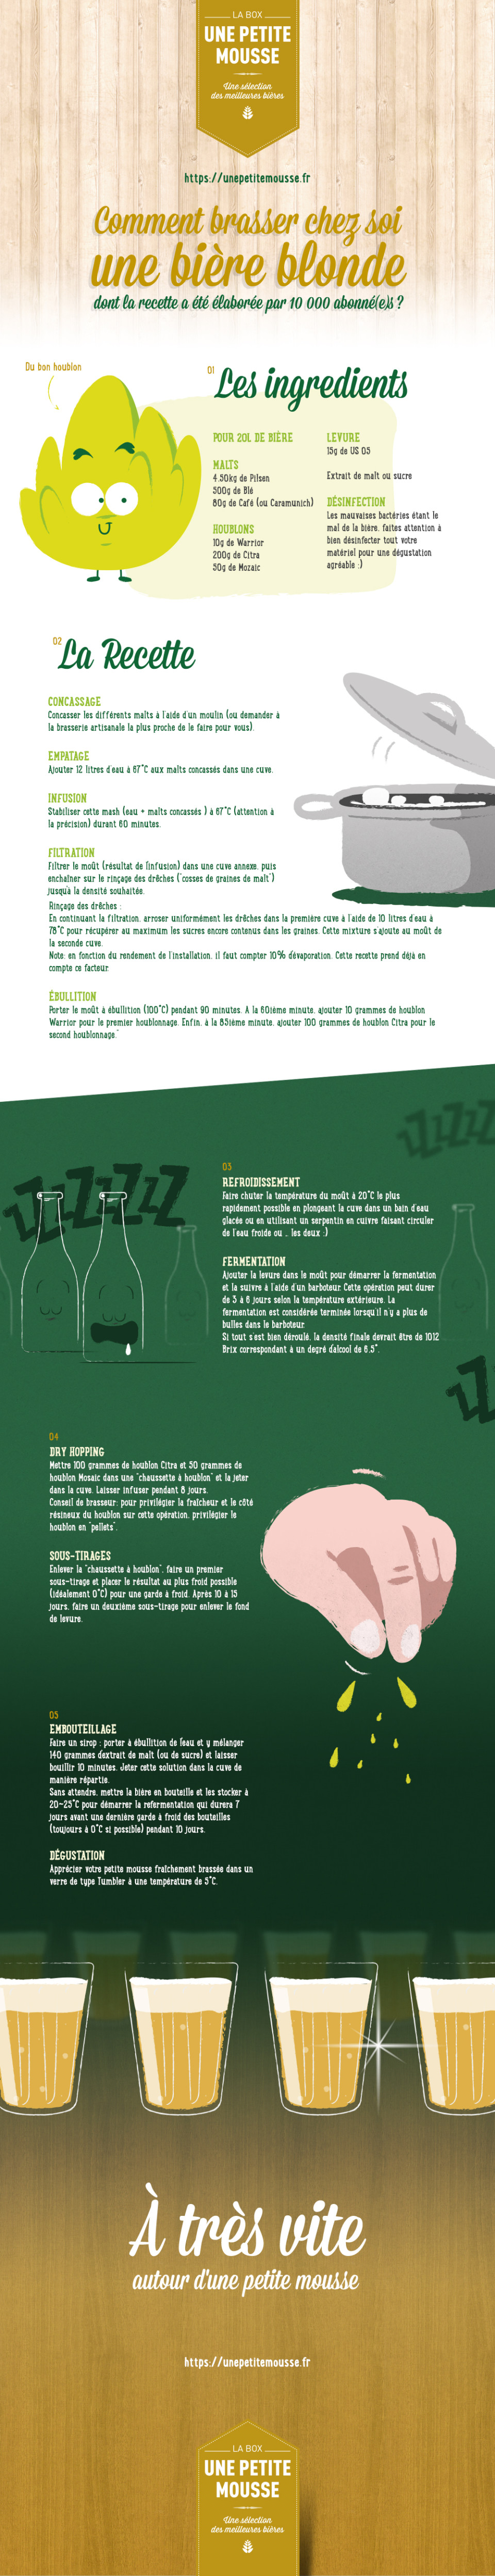 unepetitemousse infographie brasser sa biere